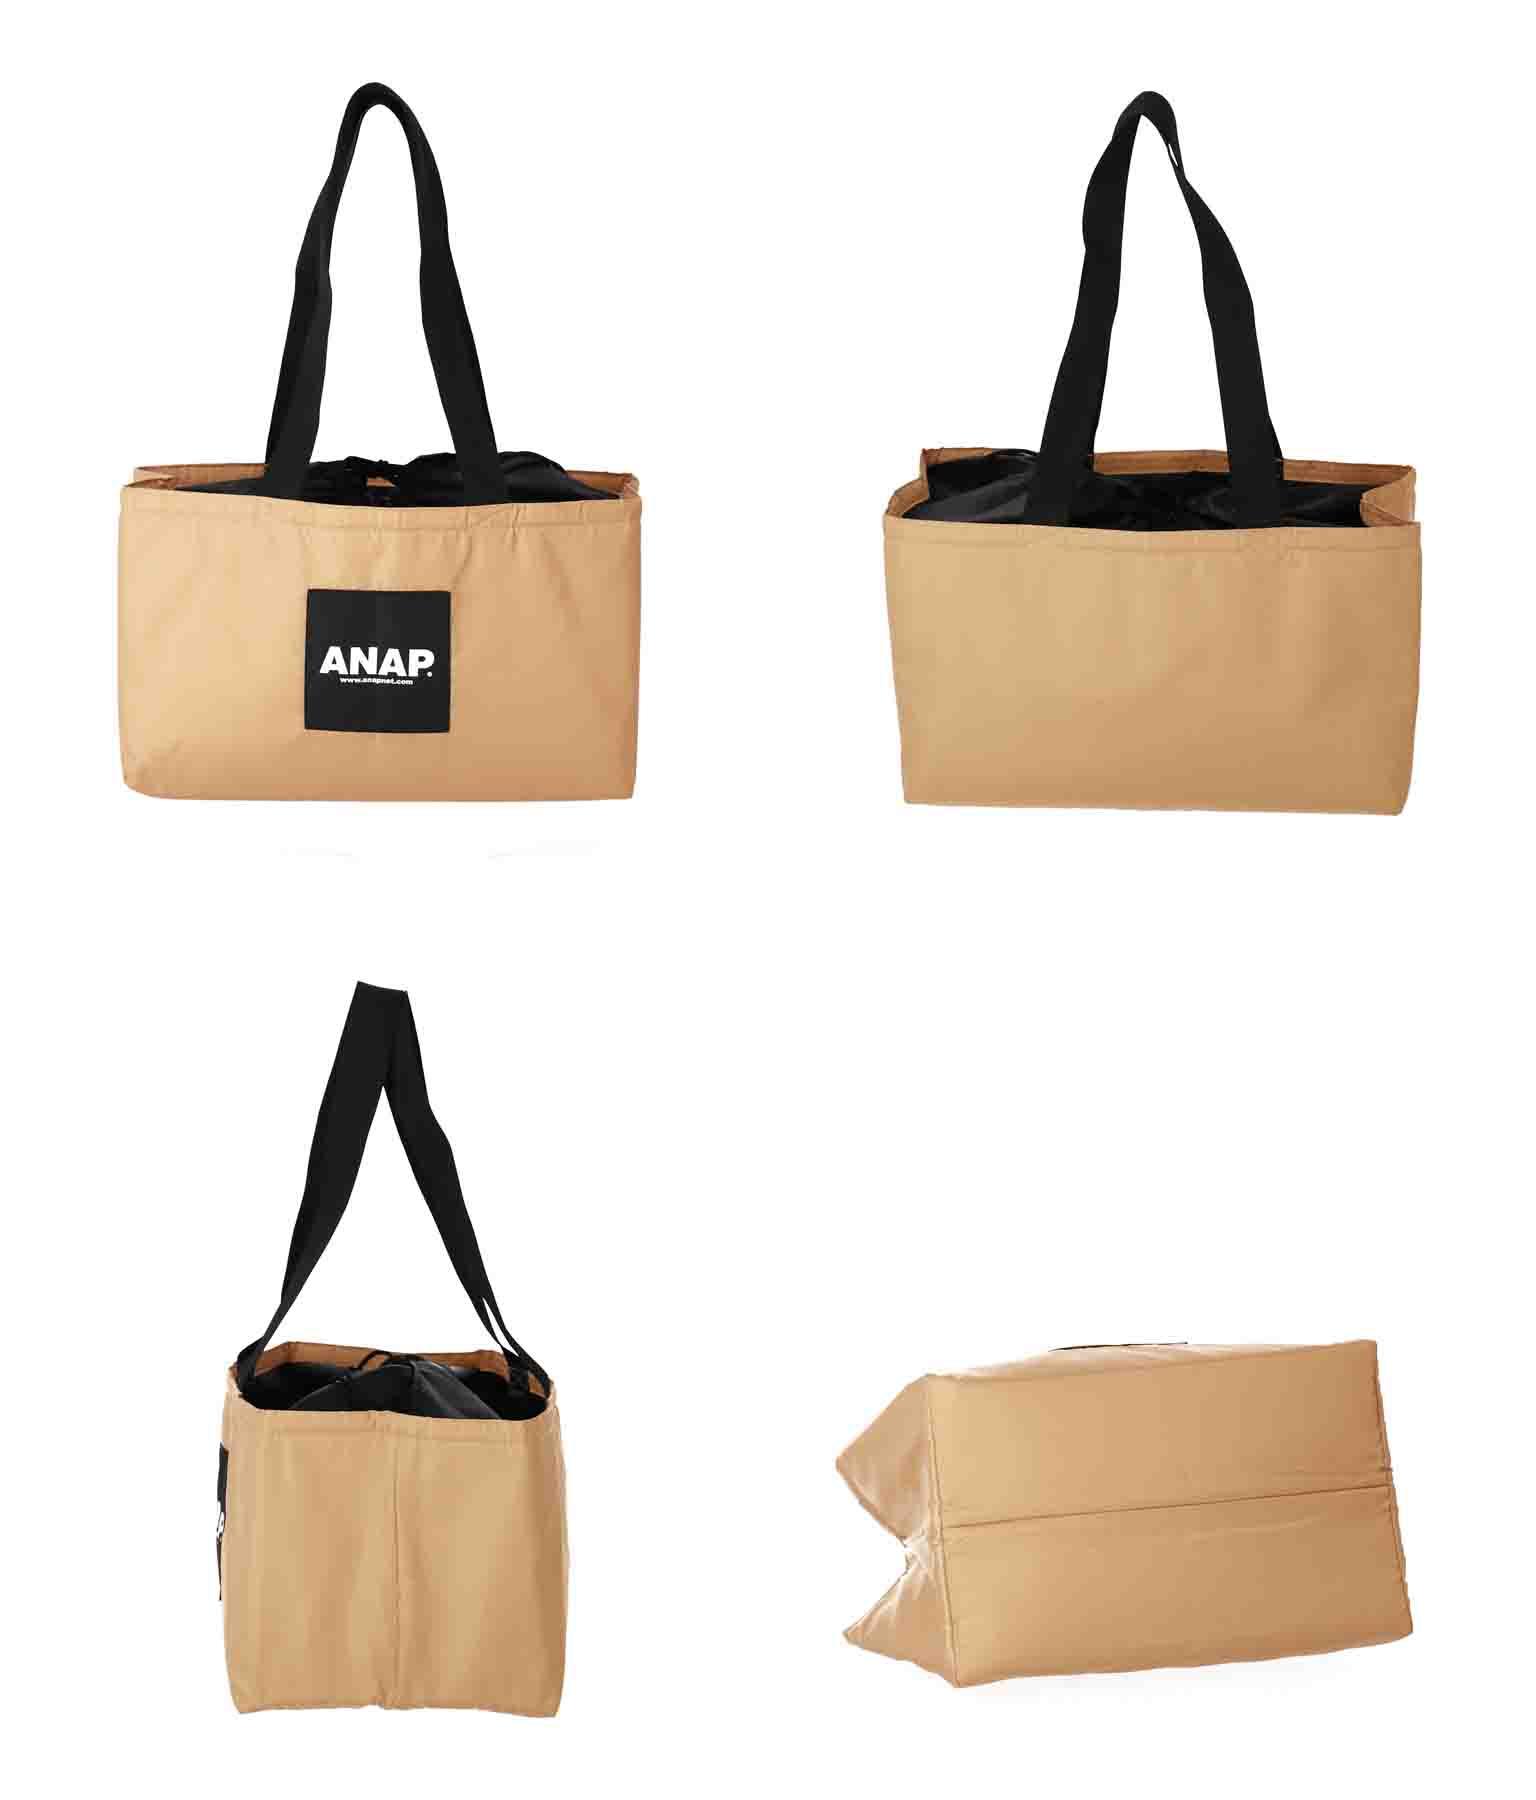 ANAPロゴ保冷レジカゴバッグ(バッグ・鞄・小物/トートバッグ) | ANAP HOME